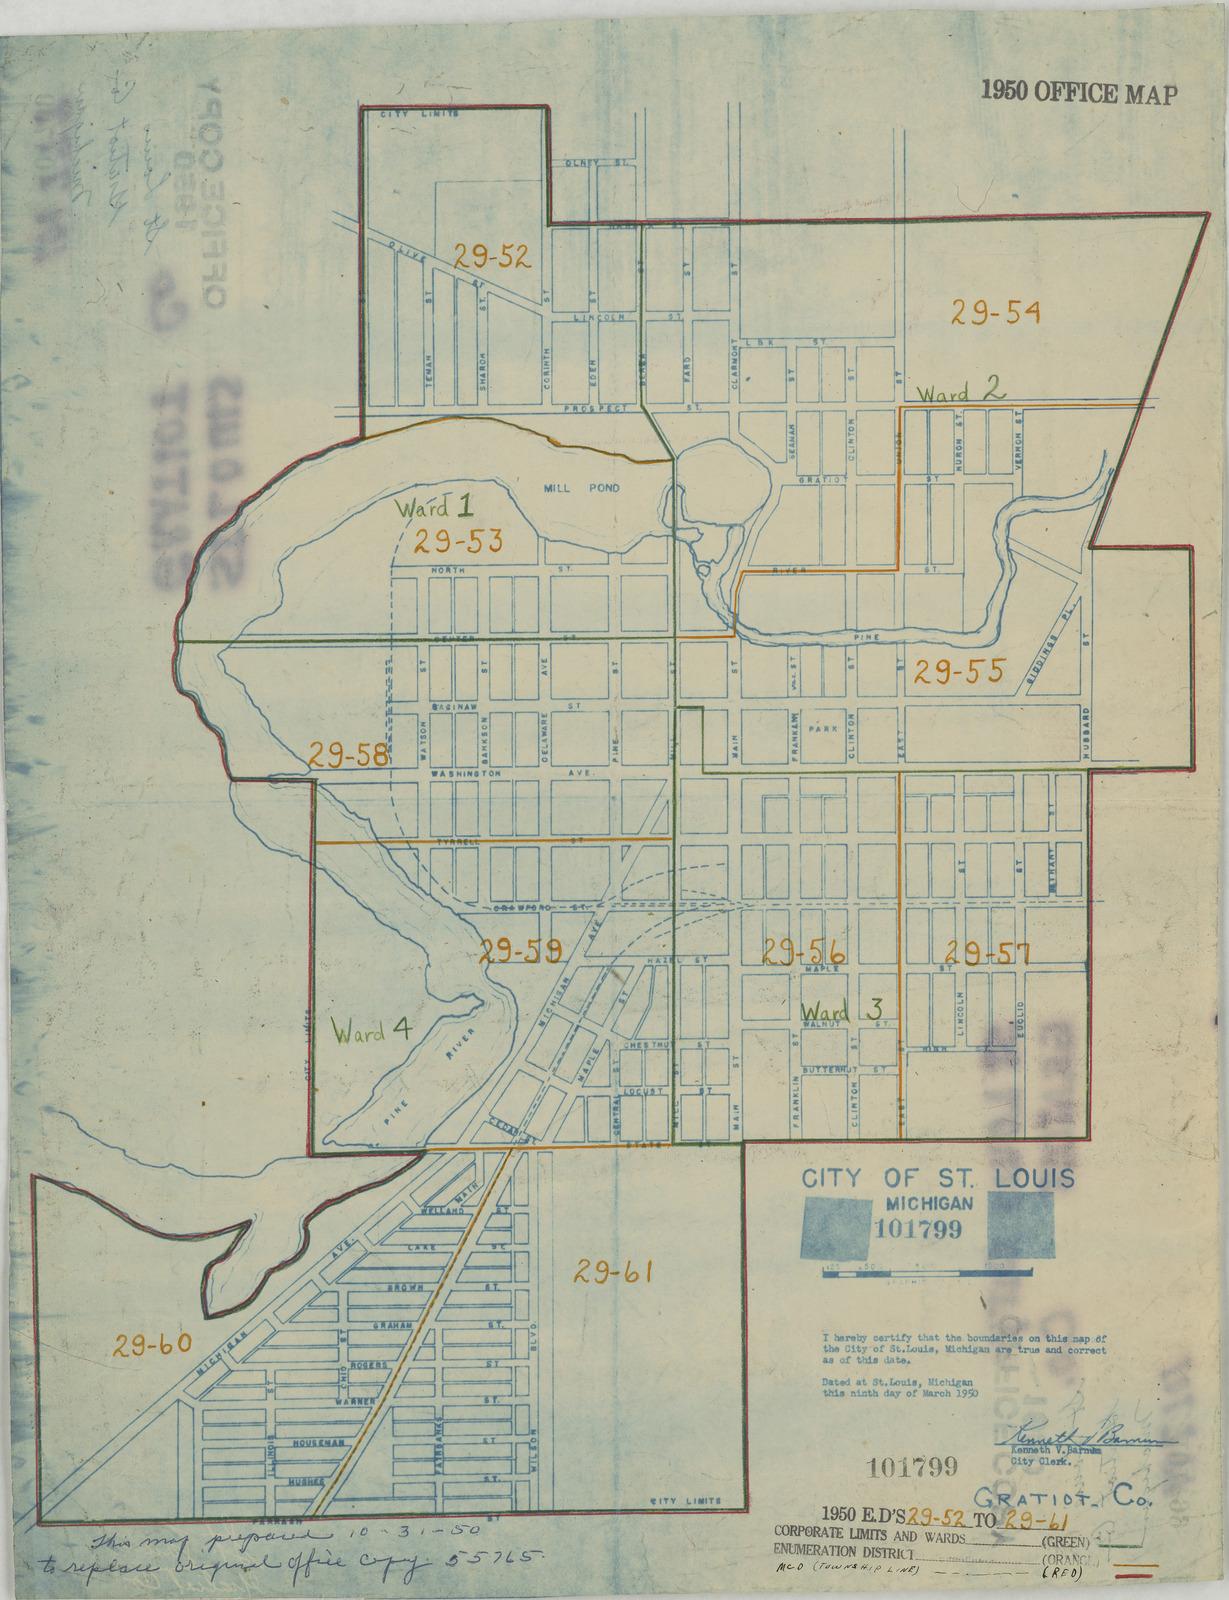 1950 Census Enumeration District Maps - Michigan (MI) - Gratiot County - St. Louis - ED 29-52 to 61